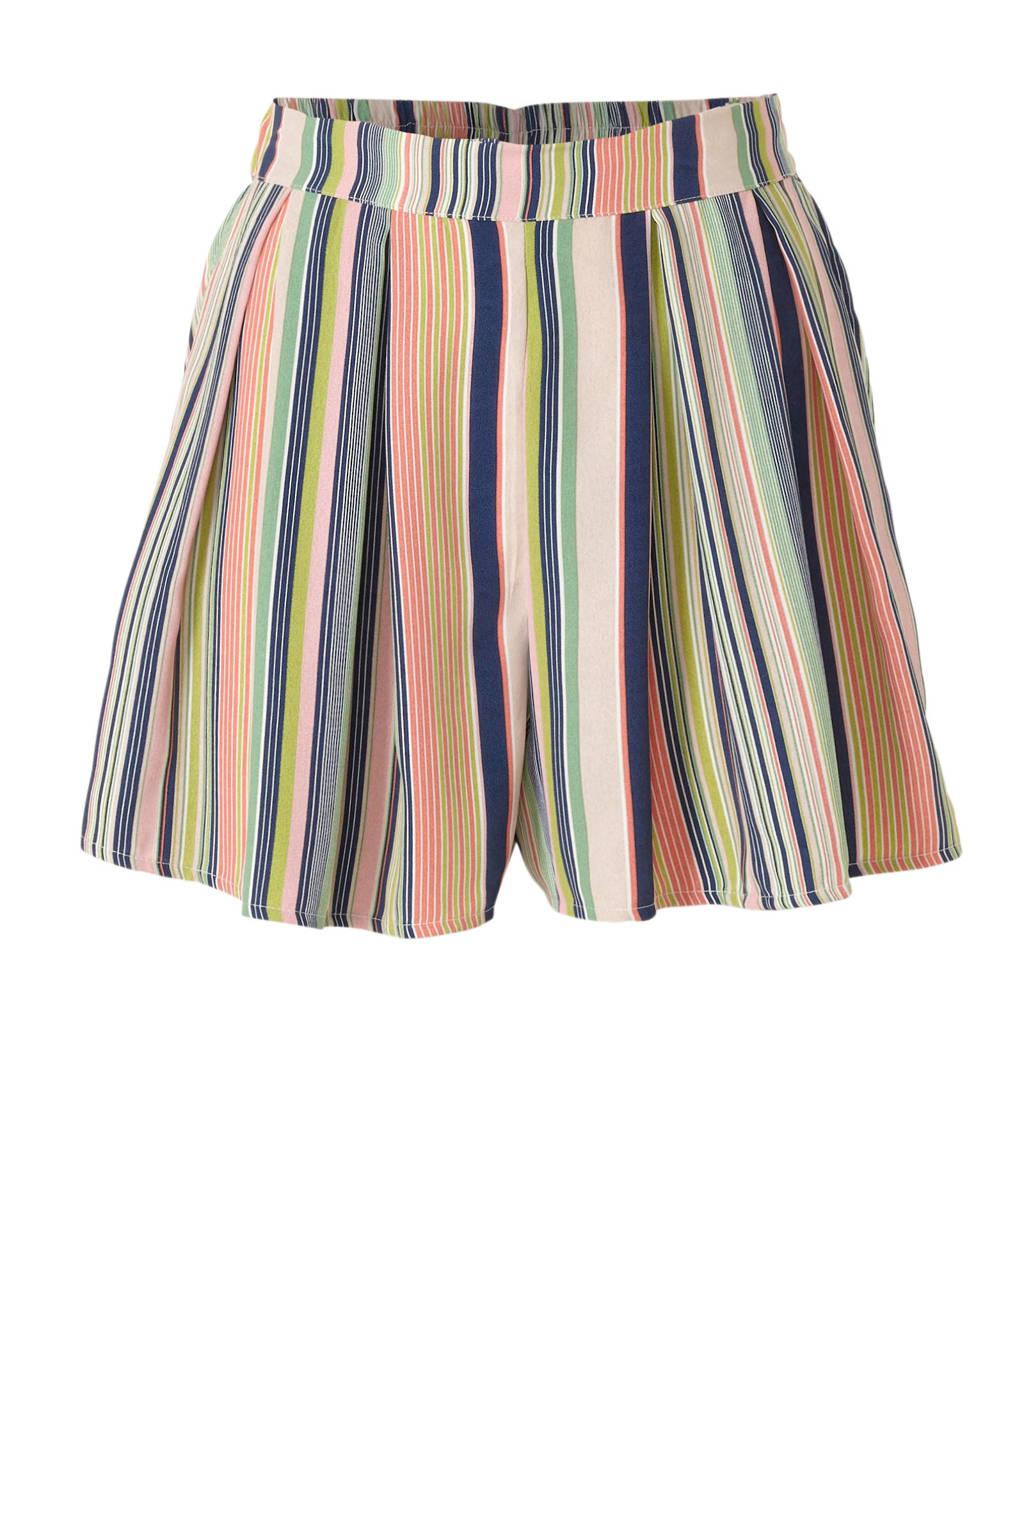 Colourful Rebel gestreepte high waist loose fit short roze/blauw/groen, Roze/blauw/groen